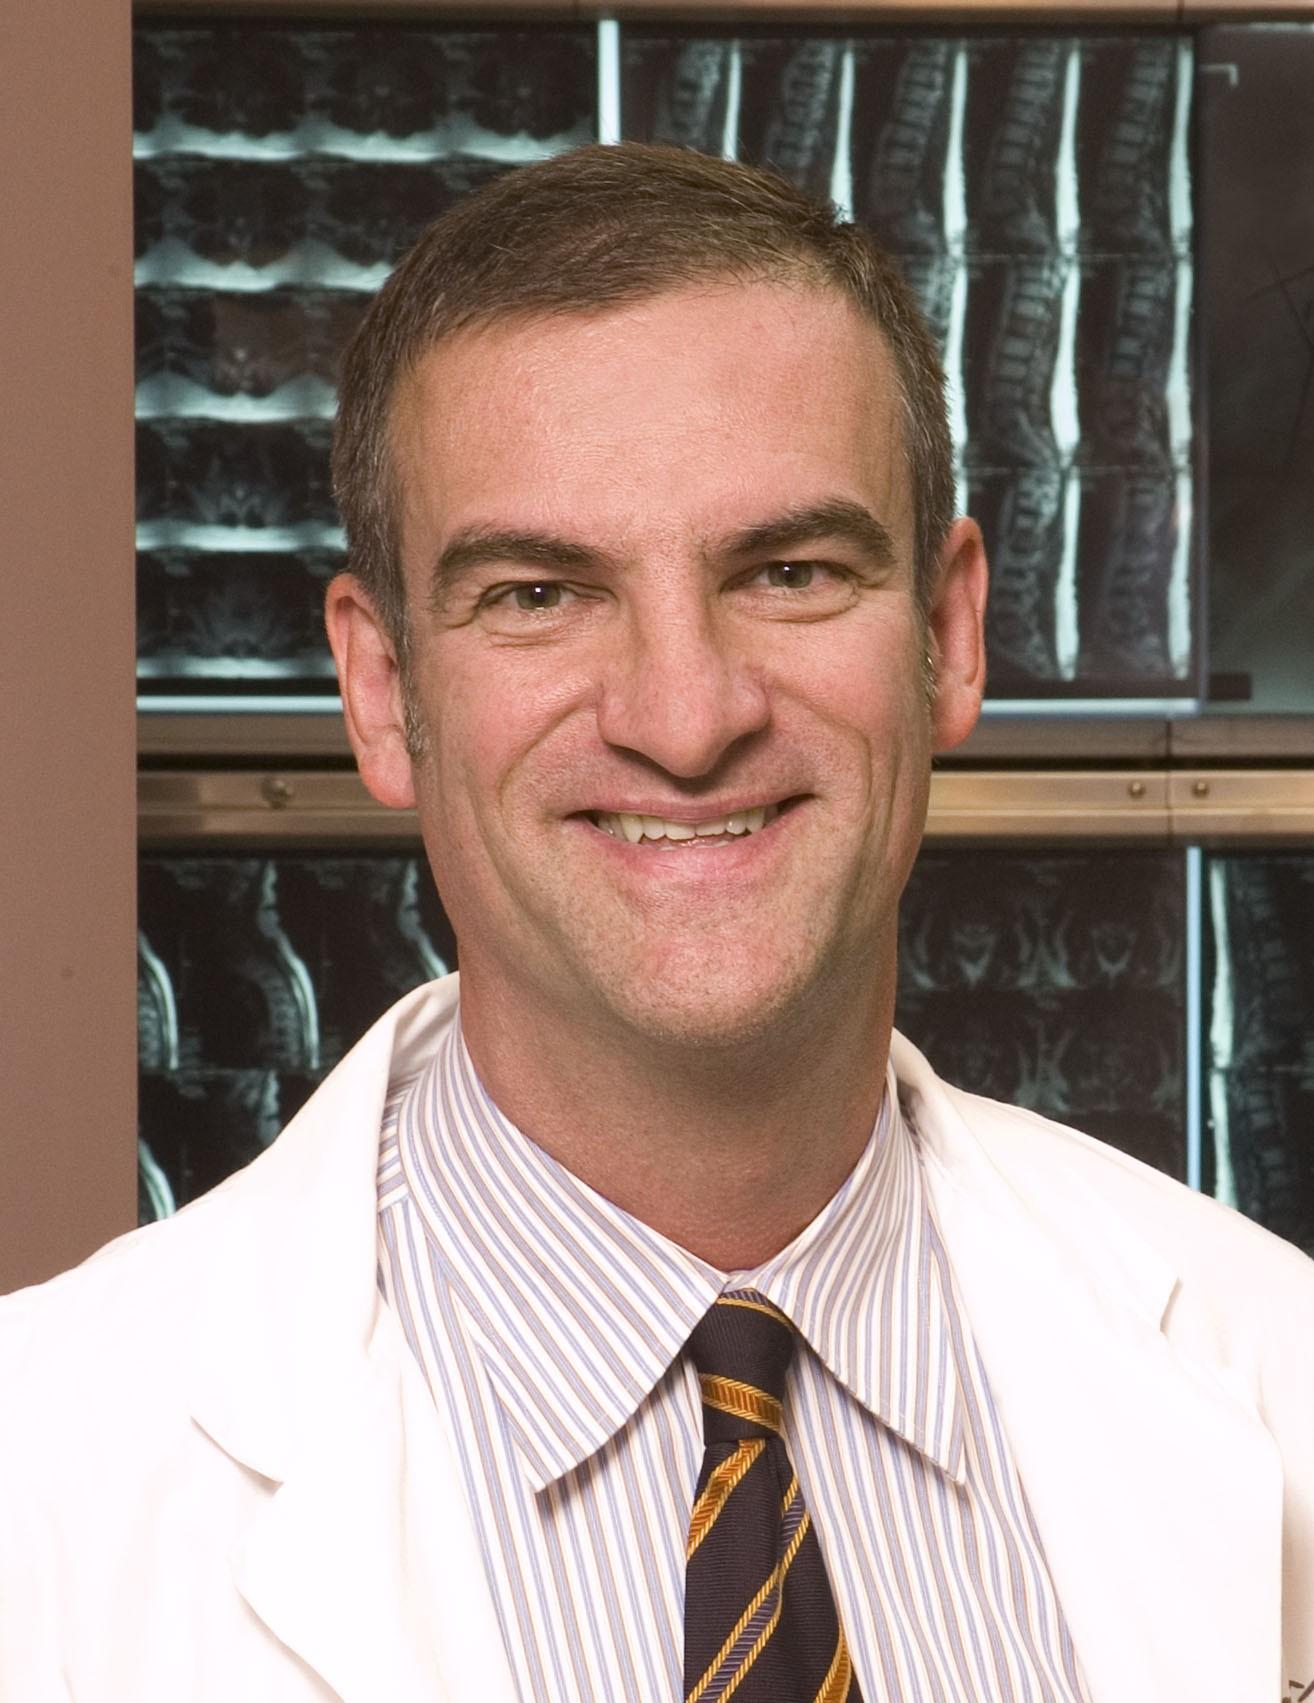 Dr. Marcel Dvorak